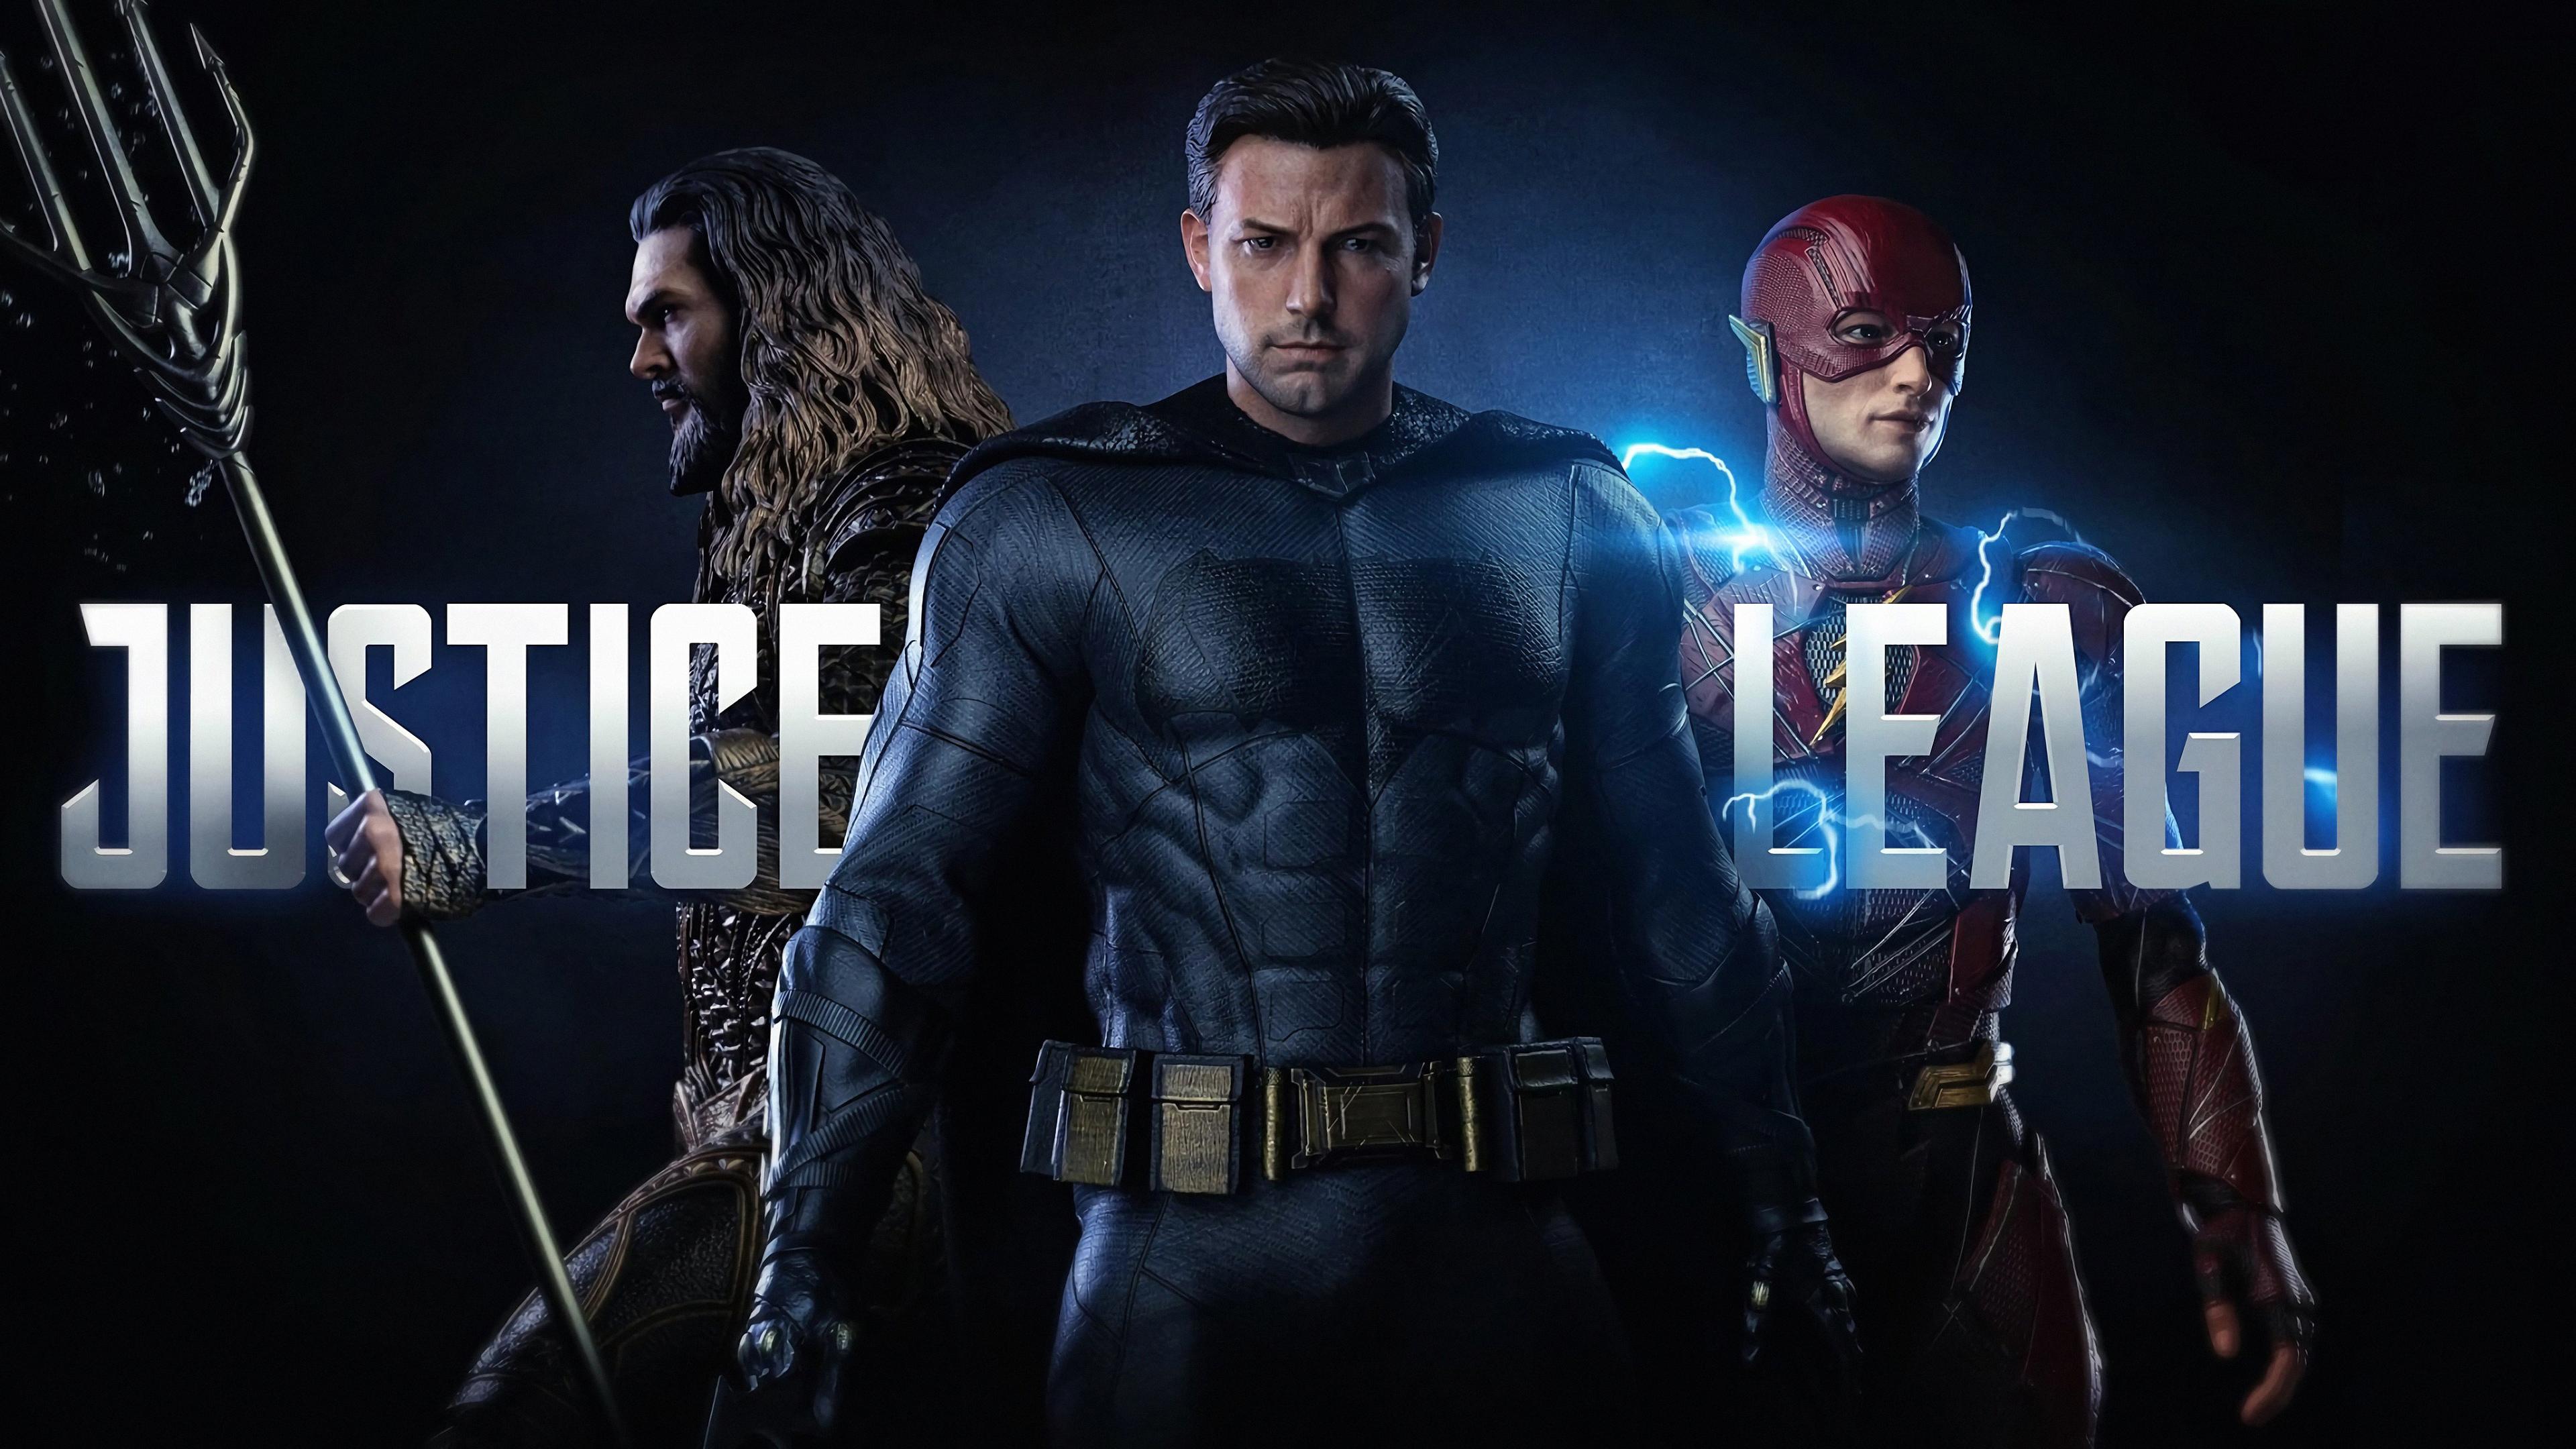 justice league heroes 1569186375 - Justice League Heroes - superheroes wallpapers, justice league wallpapers, hd-wallpapers, 4k-wallpapers